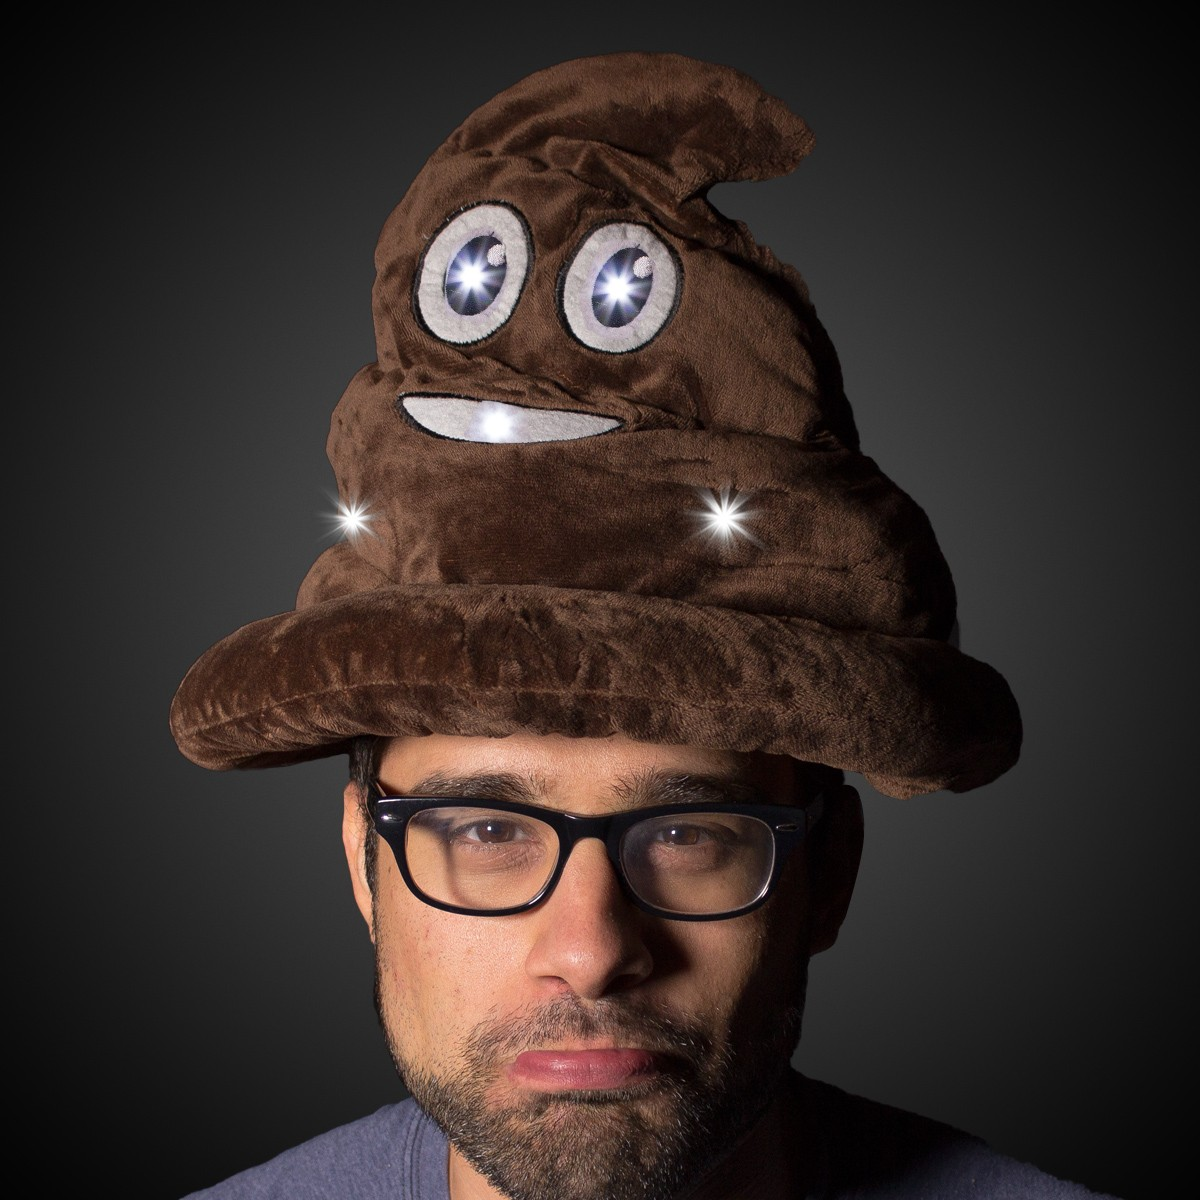 Led Poop Emojicon Hat Unimprintable Hats